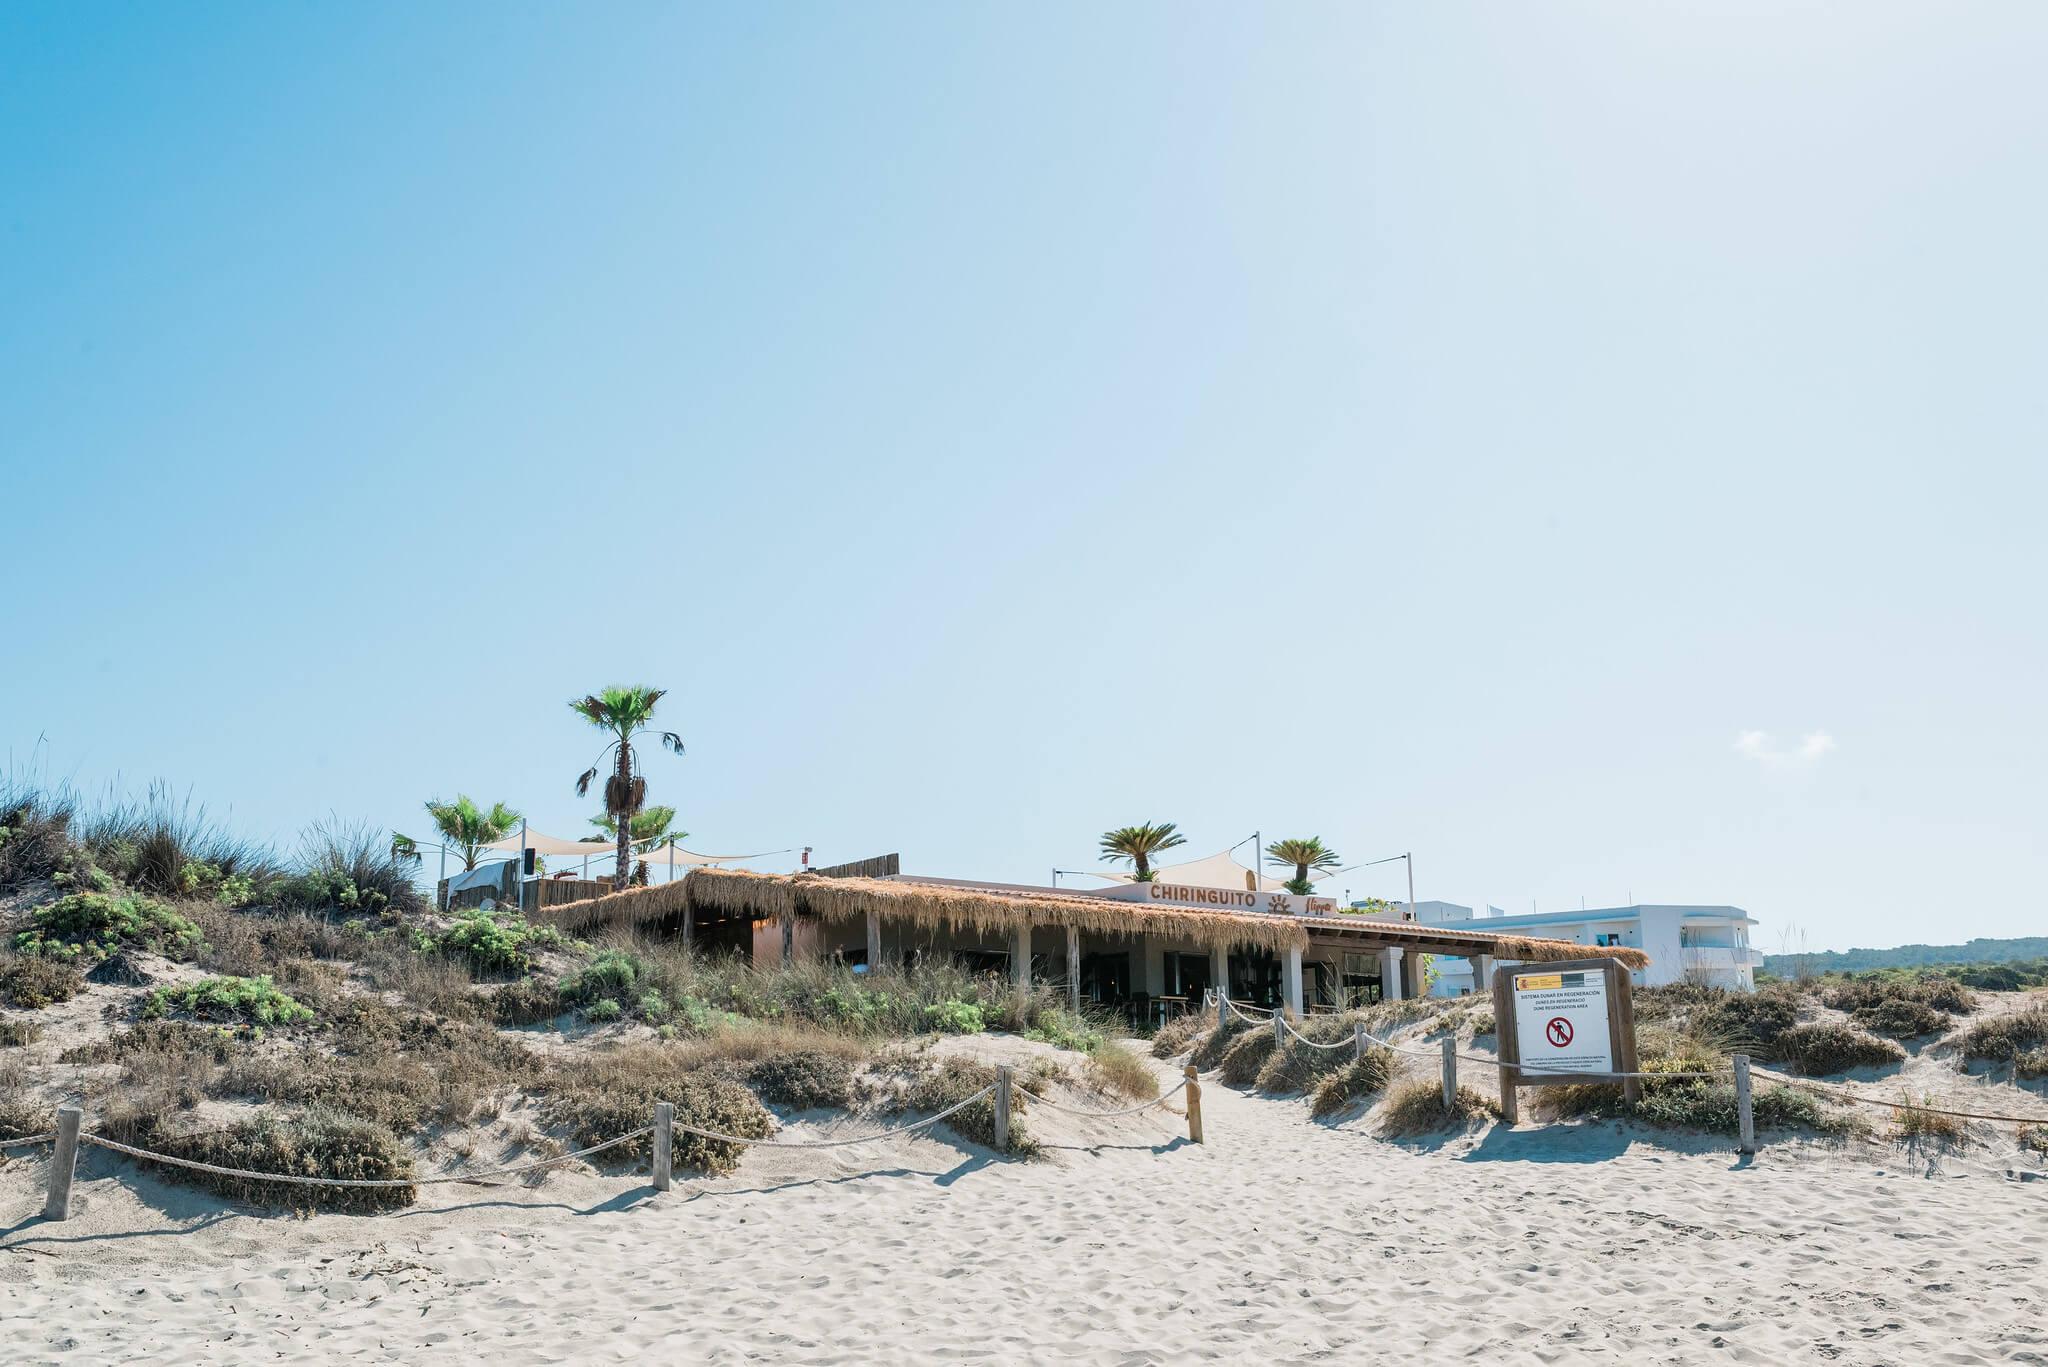 https://www.white-ibiza.com/wp-content/uploads/2020/03/formentera-beach-restaurants-flipper-2020-02.jpg